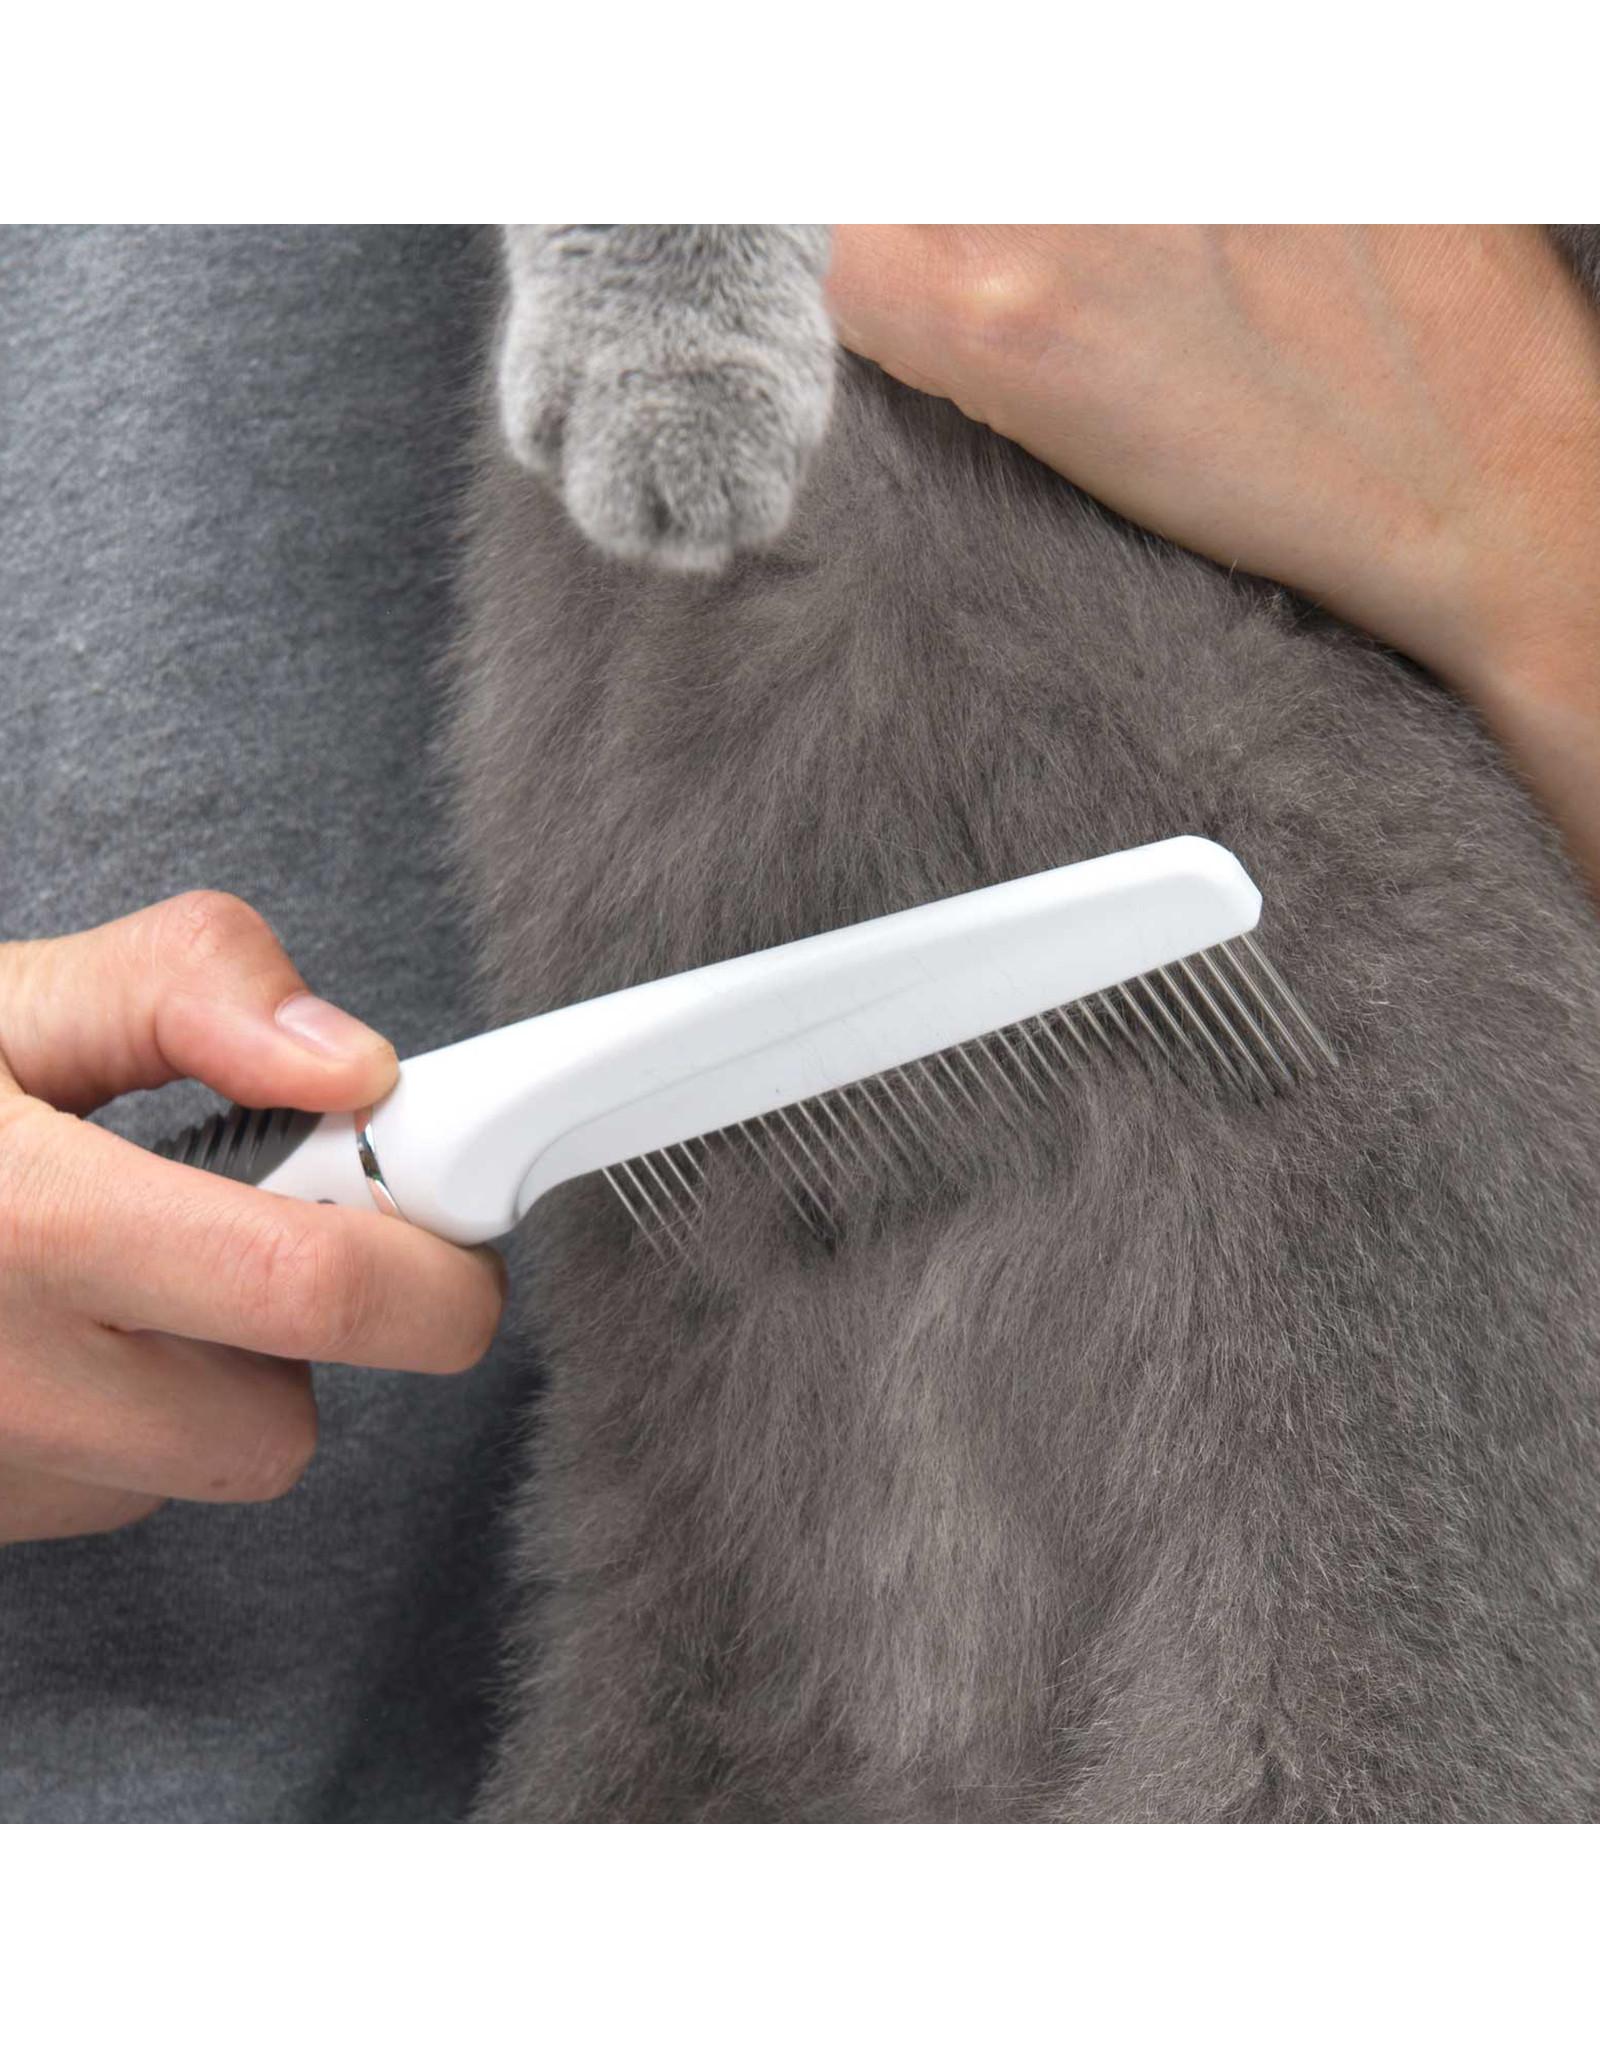 CT - Catit 2.0 Catit Grooming Kit Short Hair